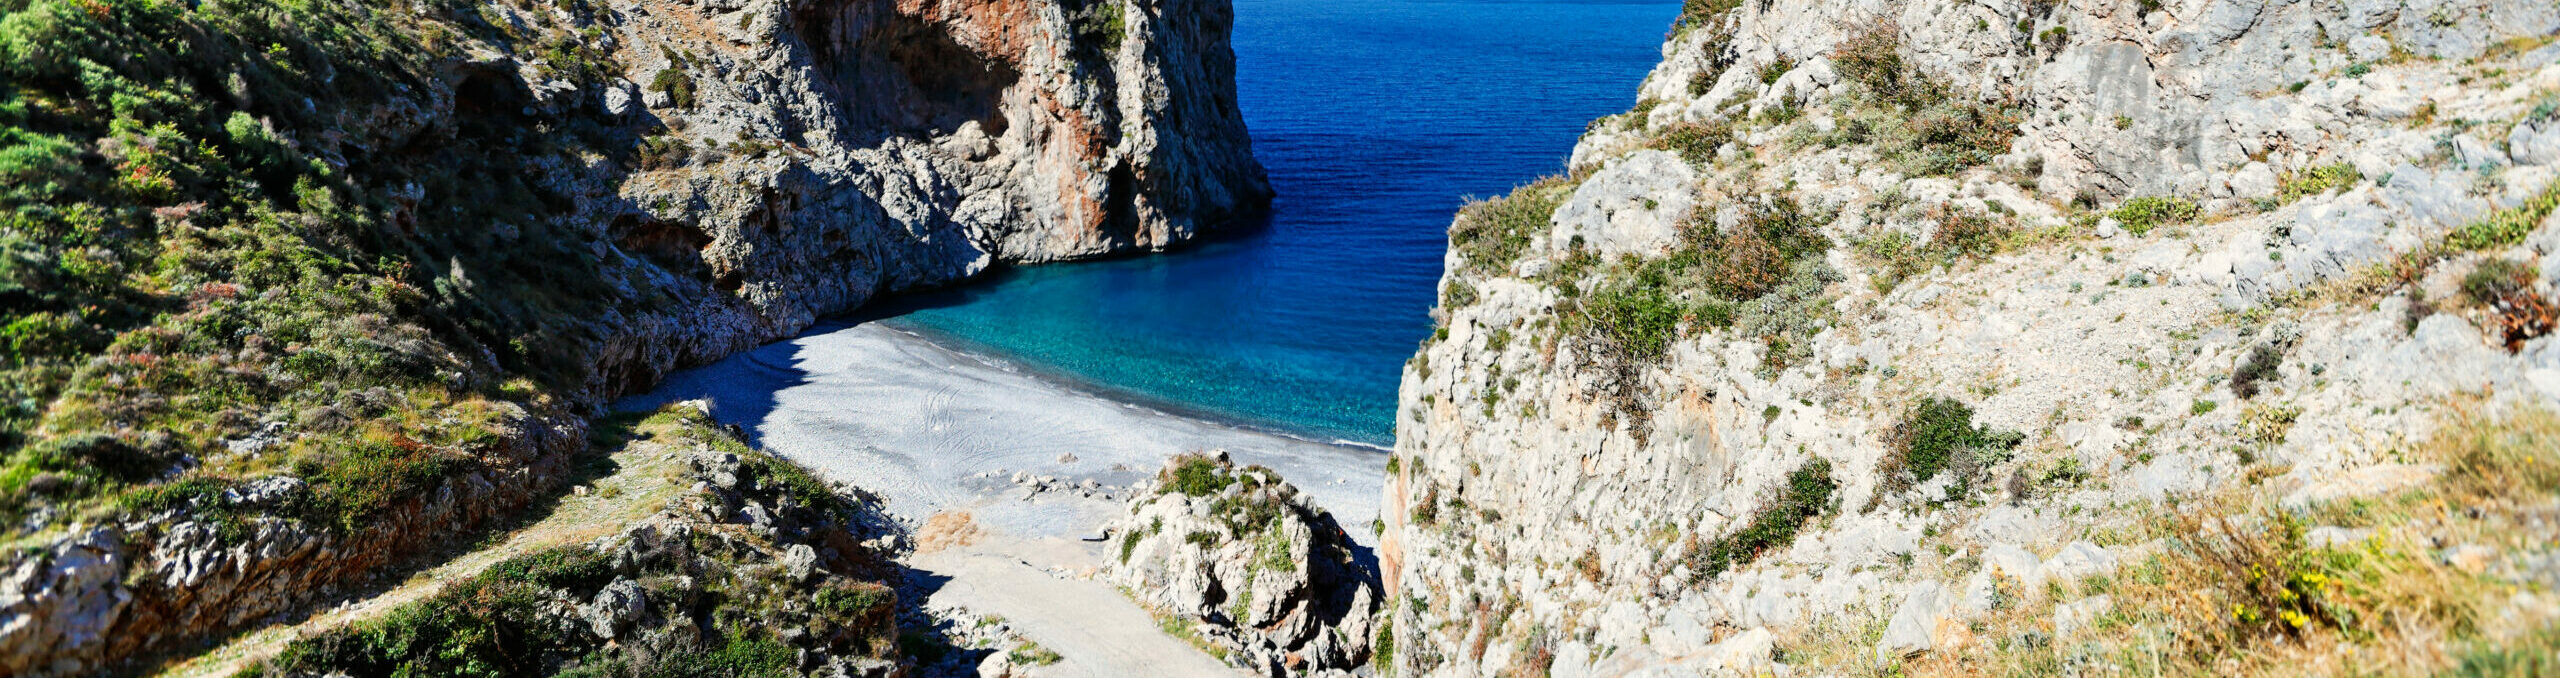 Vythouri: A beach with a rare phenomenon in Evia